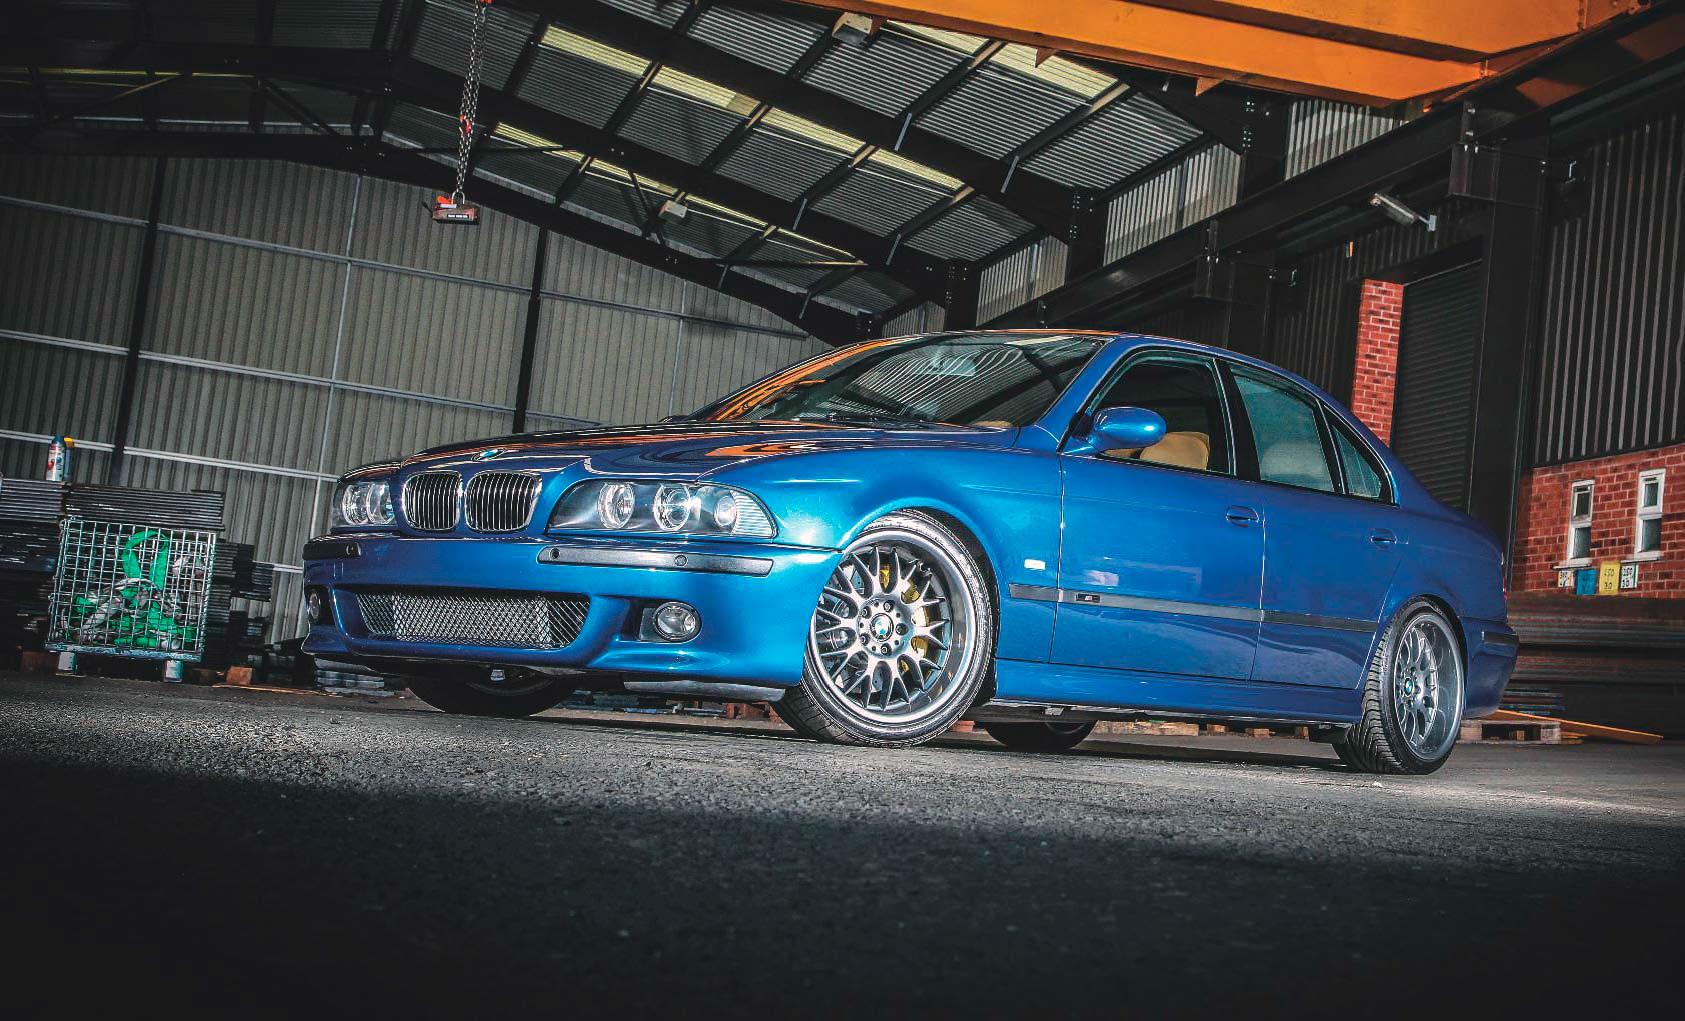 Bekend BMW 540i E39 – whith Jaguar-Eaton Blower tuned 386bhp - Drive-My #LM22